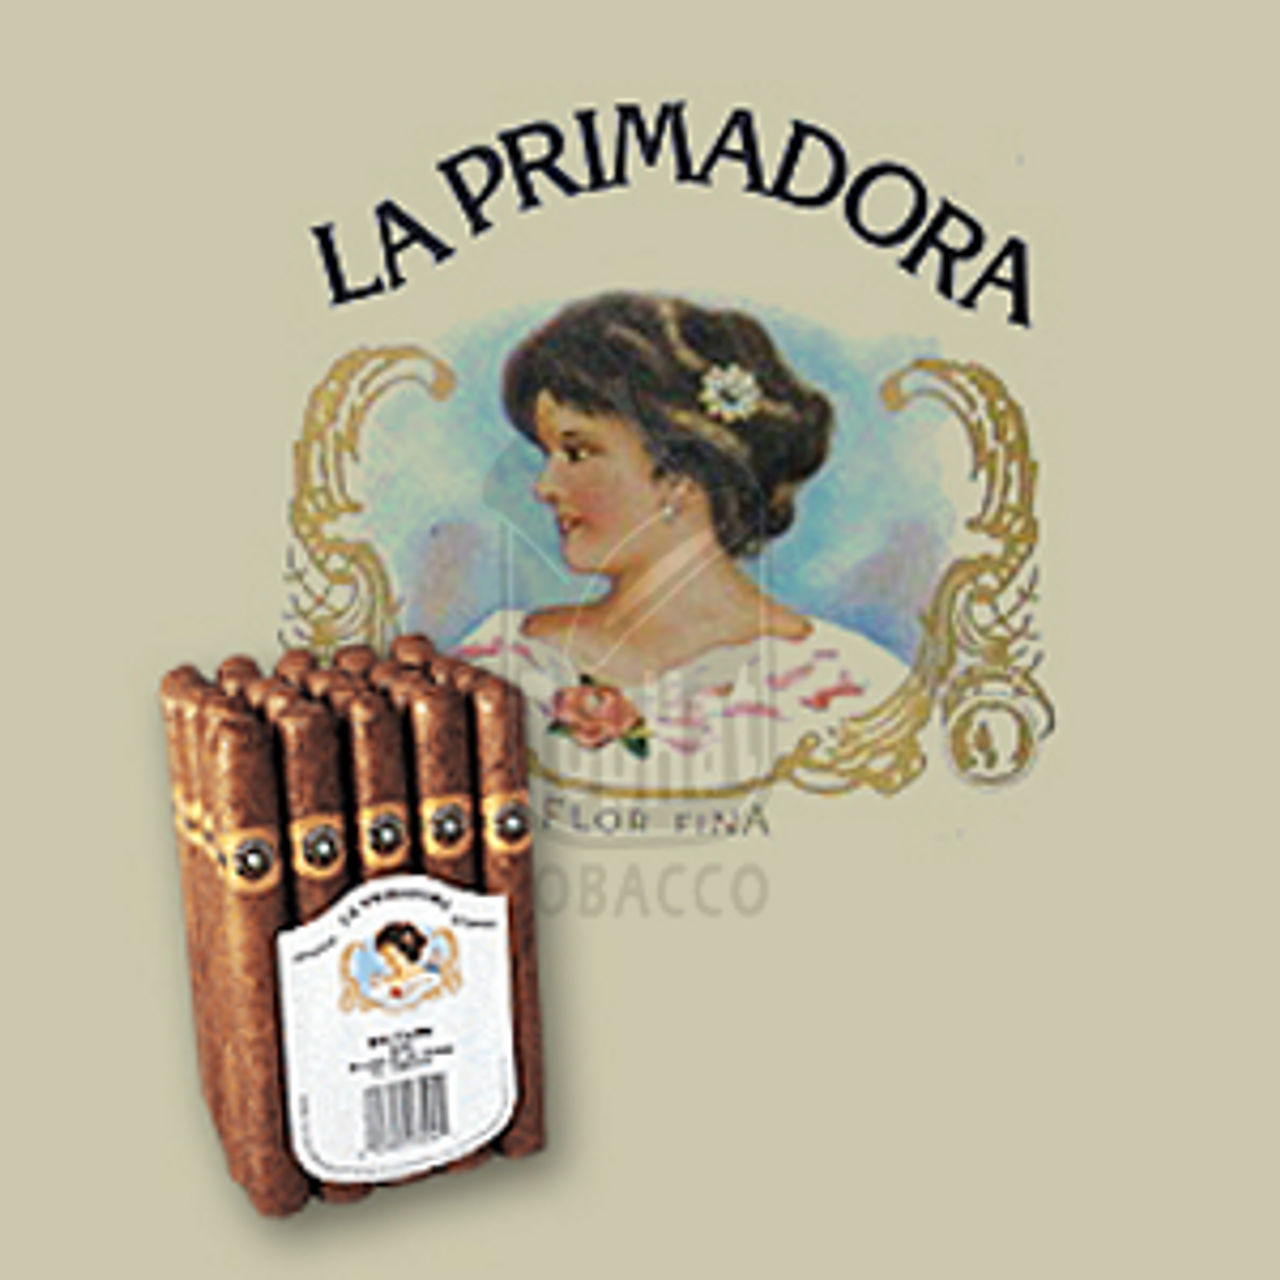 La Primadora Solitaire Natural Cigars - 6 x 50 (Bundle of 25)